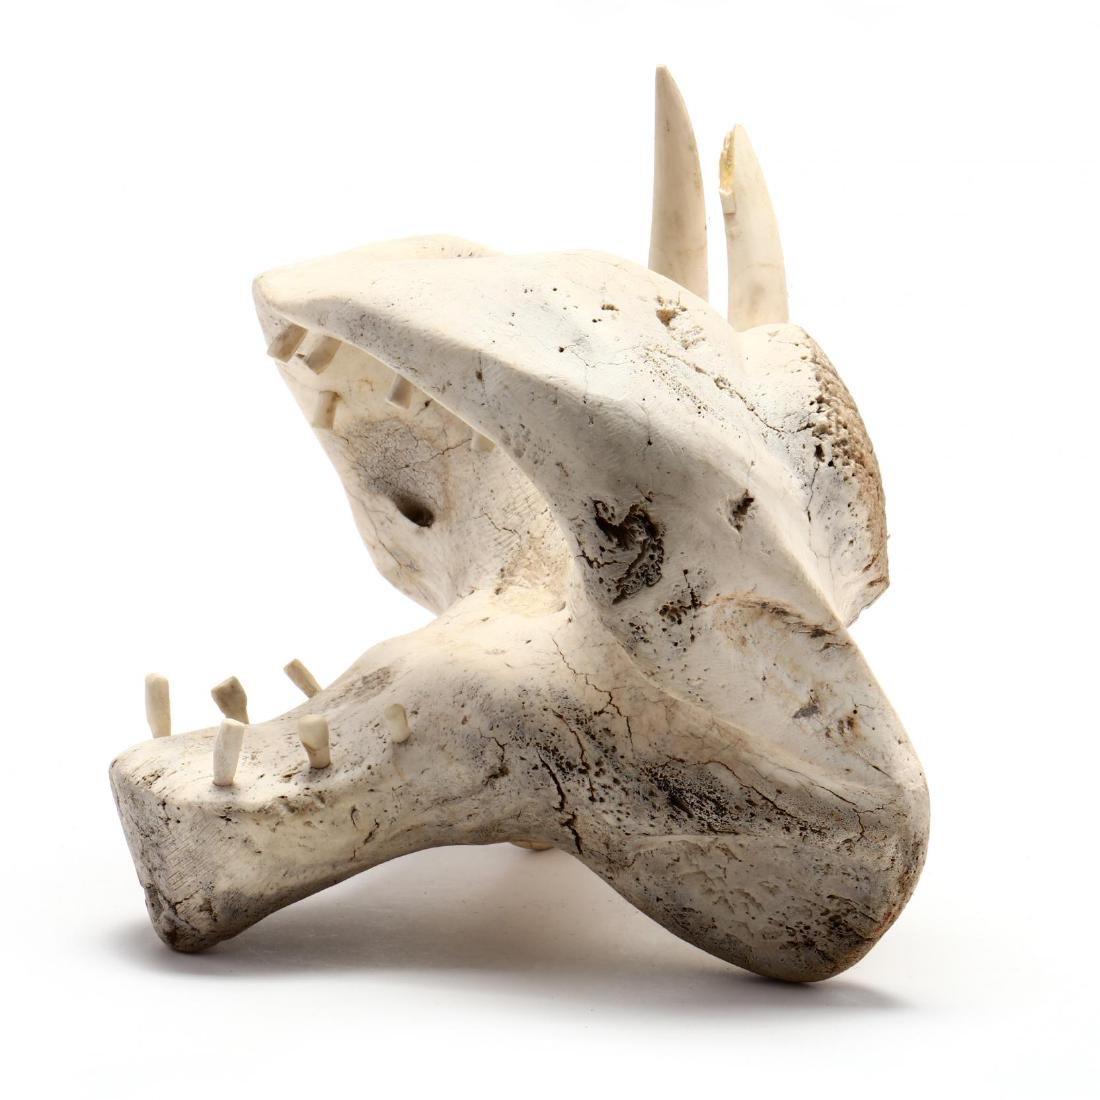 Inuit Sculpture of a Roaring Bear's Head - 4